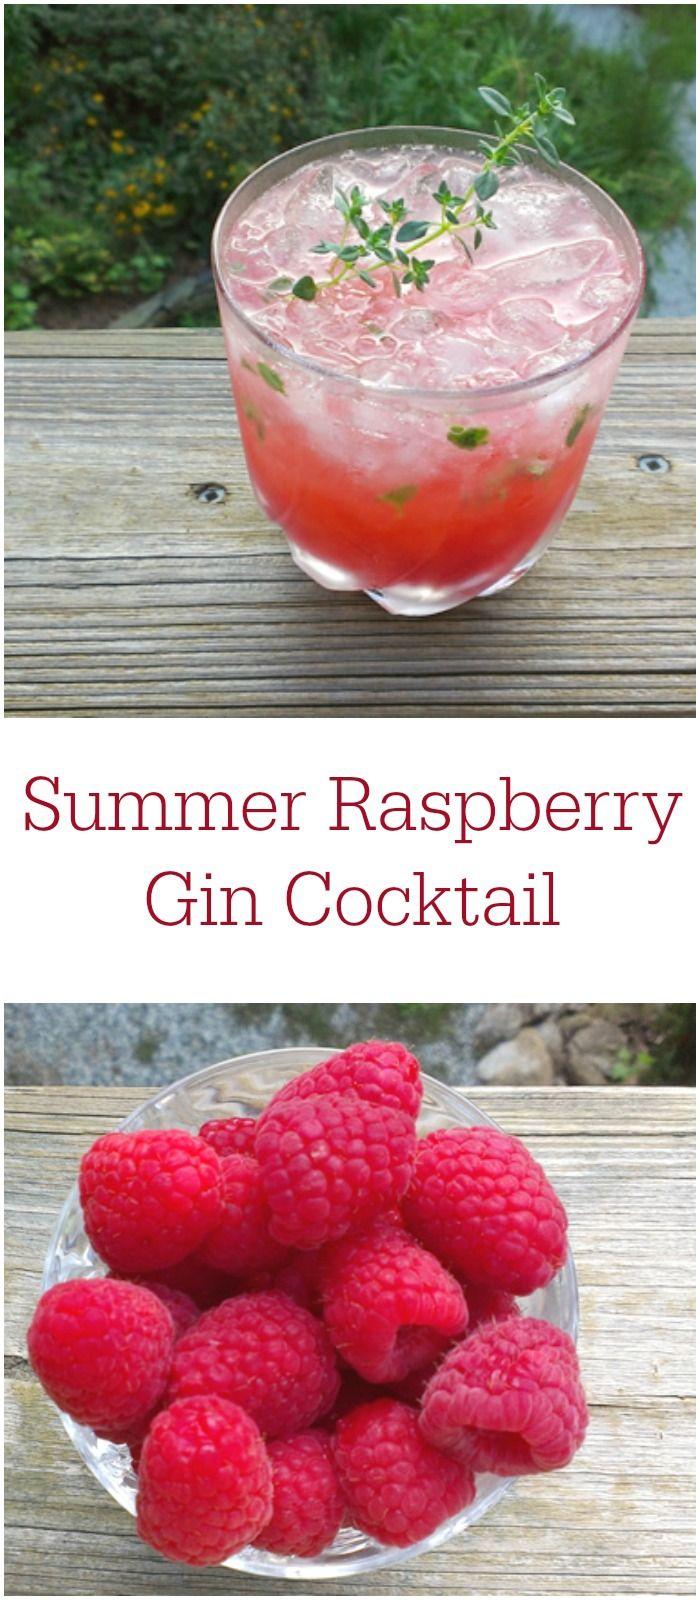 Summer Raspberry Gin Cocktail | Recipe | Cocktails ...